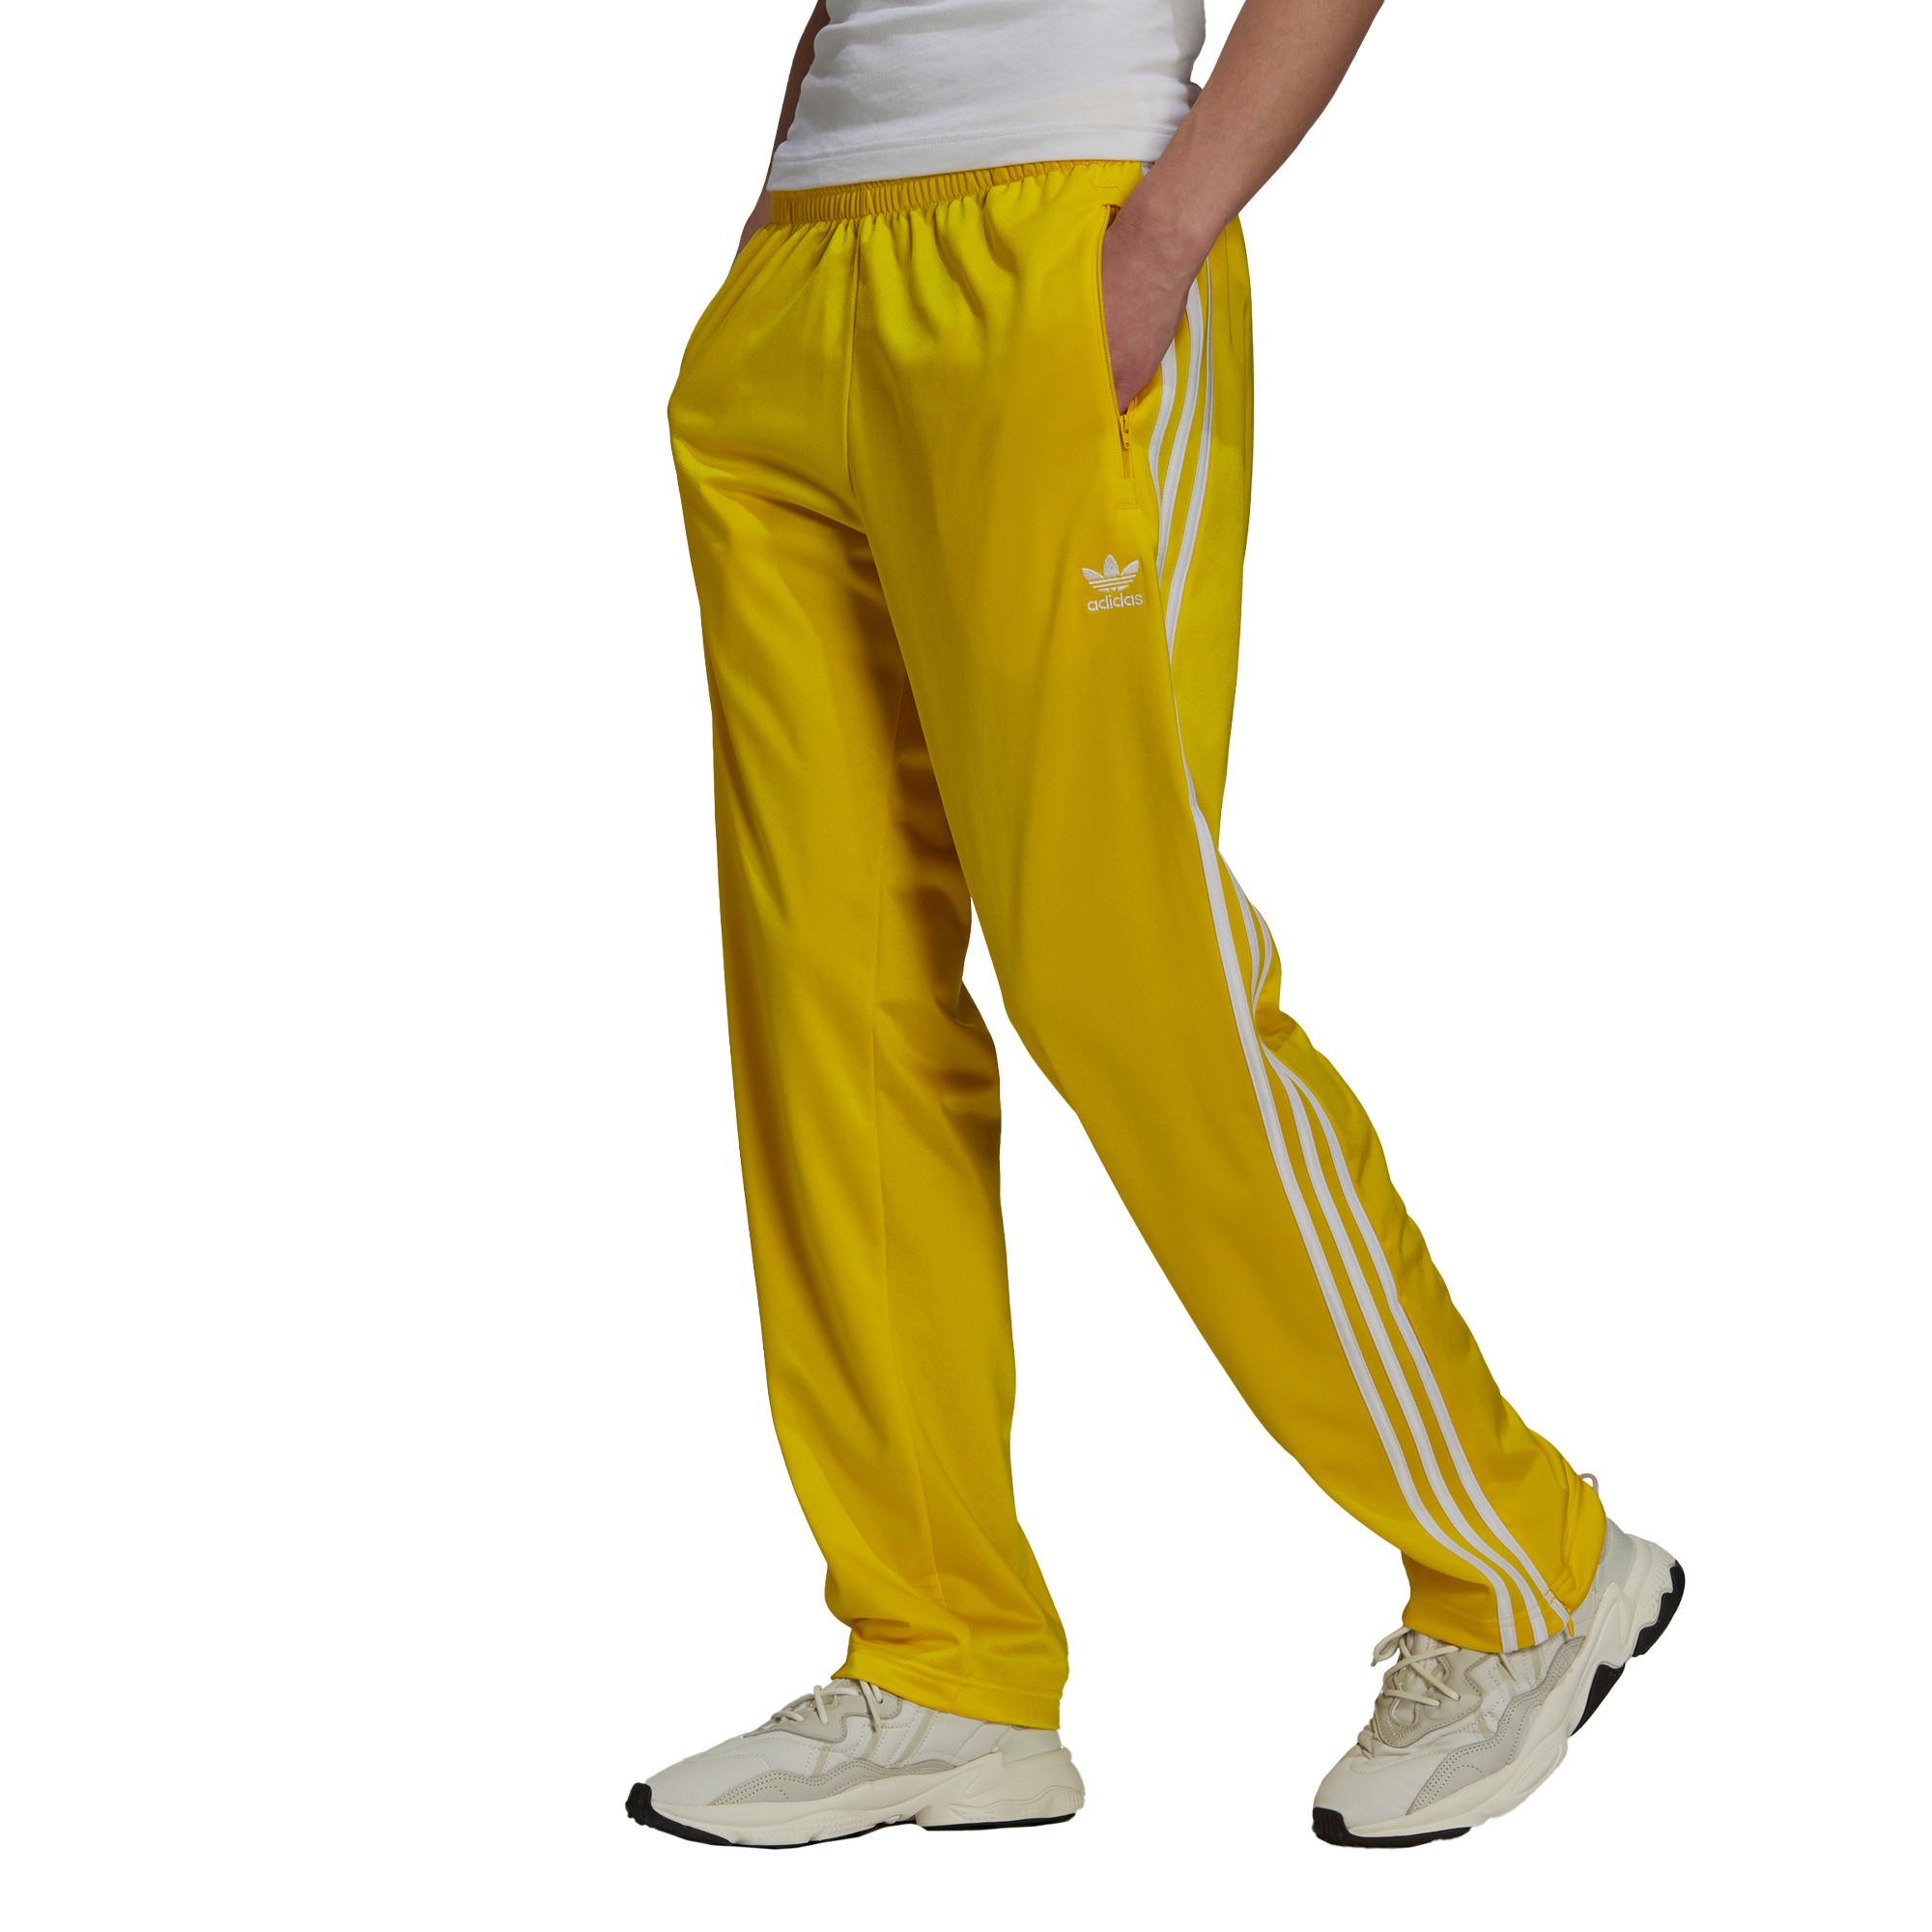 Pantaloni tuta uomo adicolor Classics Firebird Primeblue, Giallo, large image number 0